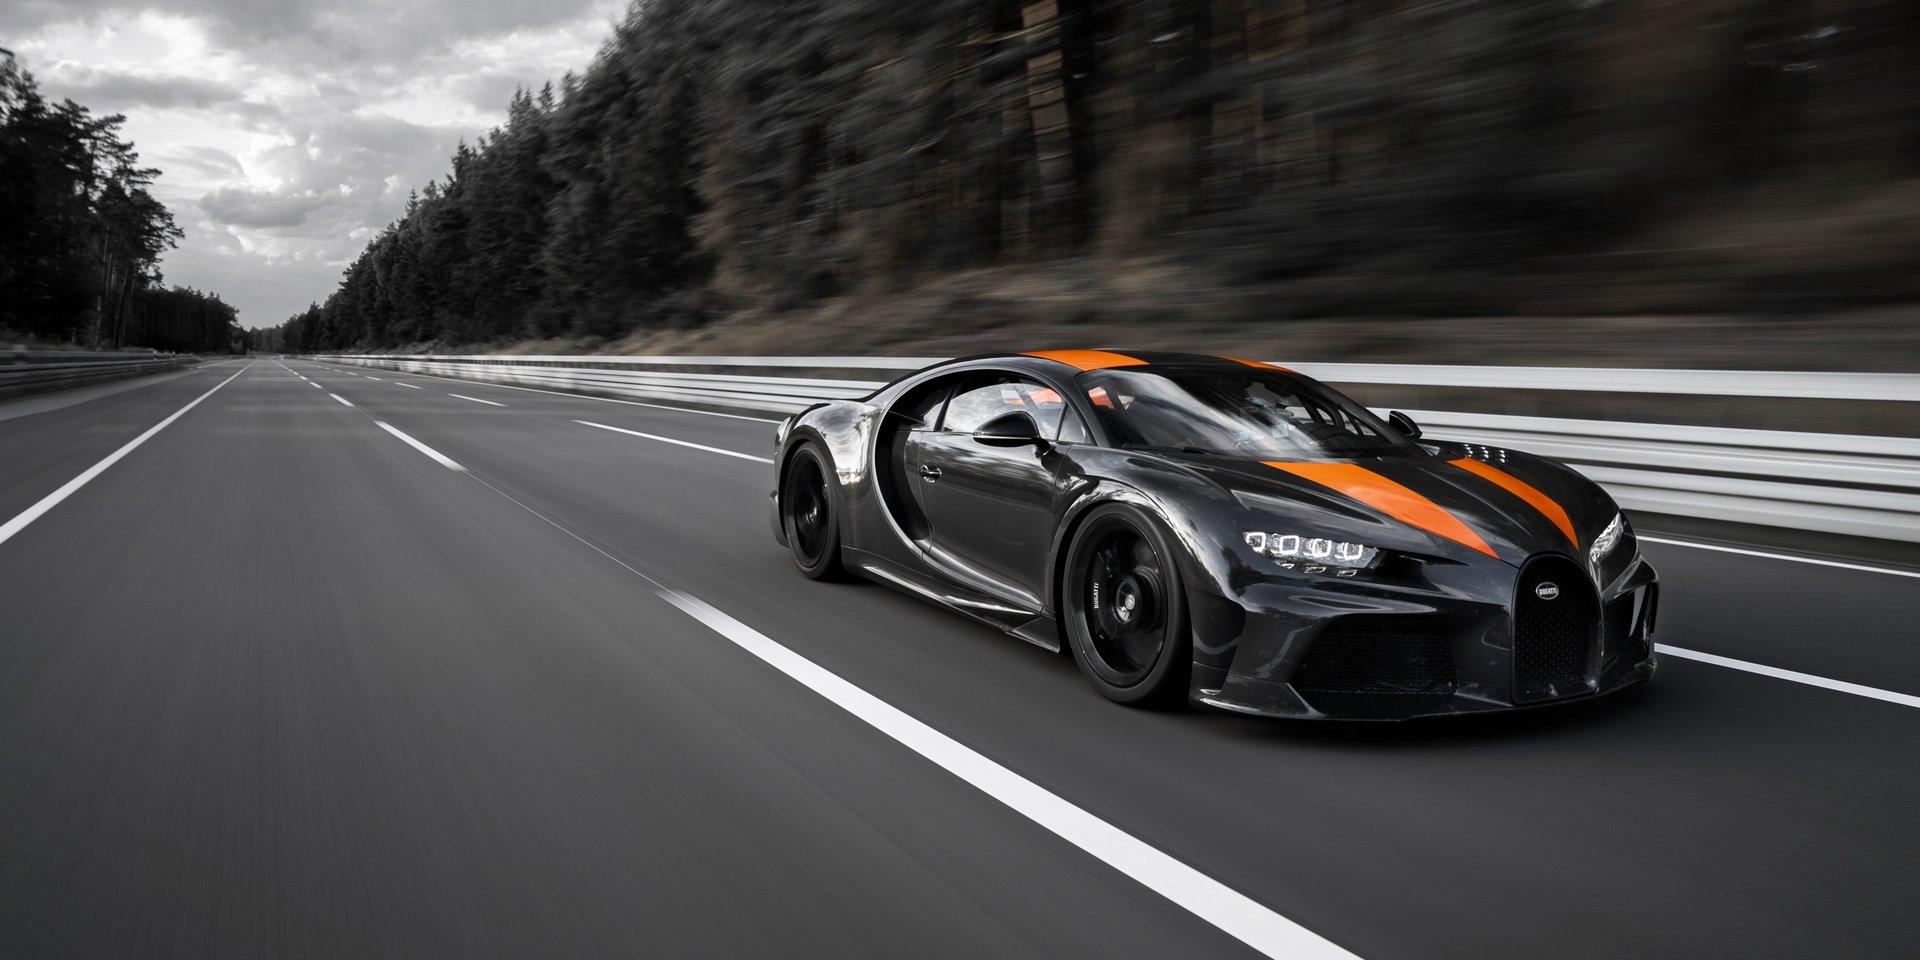 再次寫下極速紀錄 Bugatti Chiron Prototype突破490km/h大關!